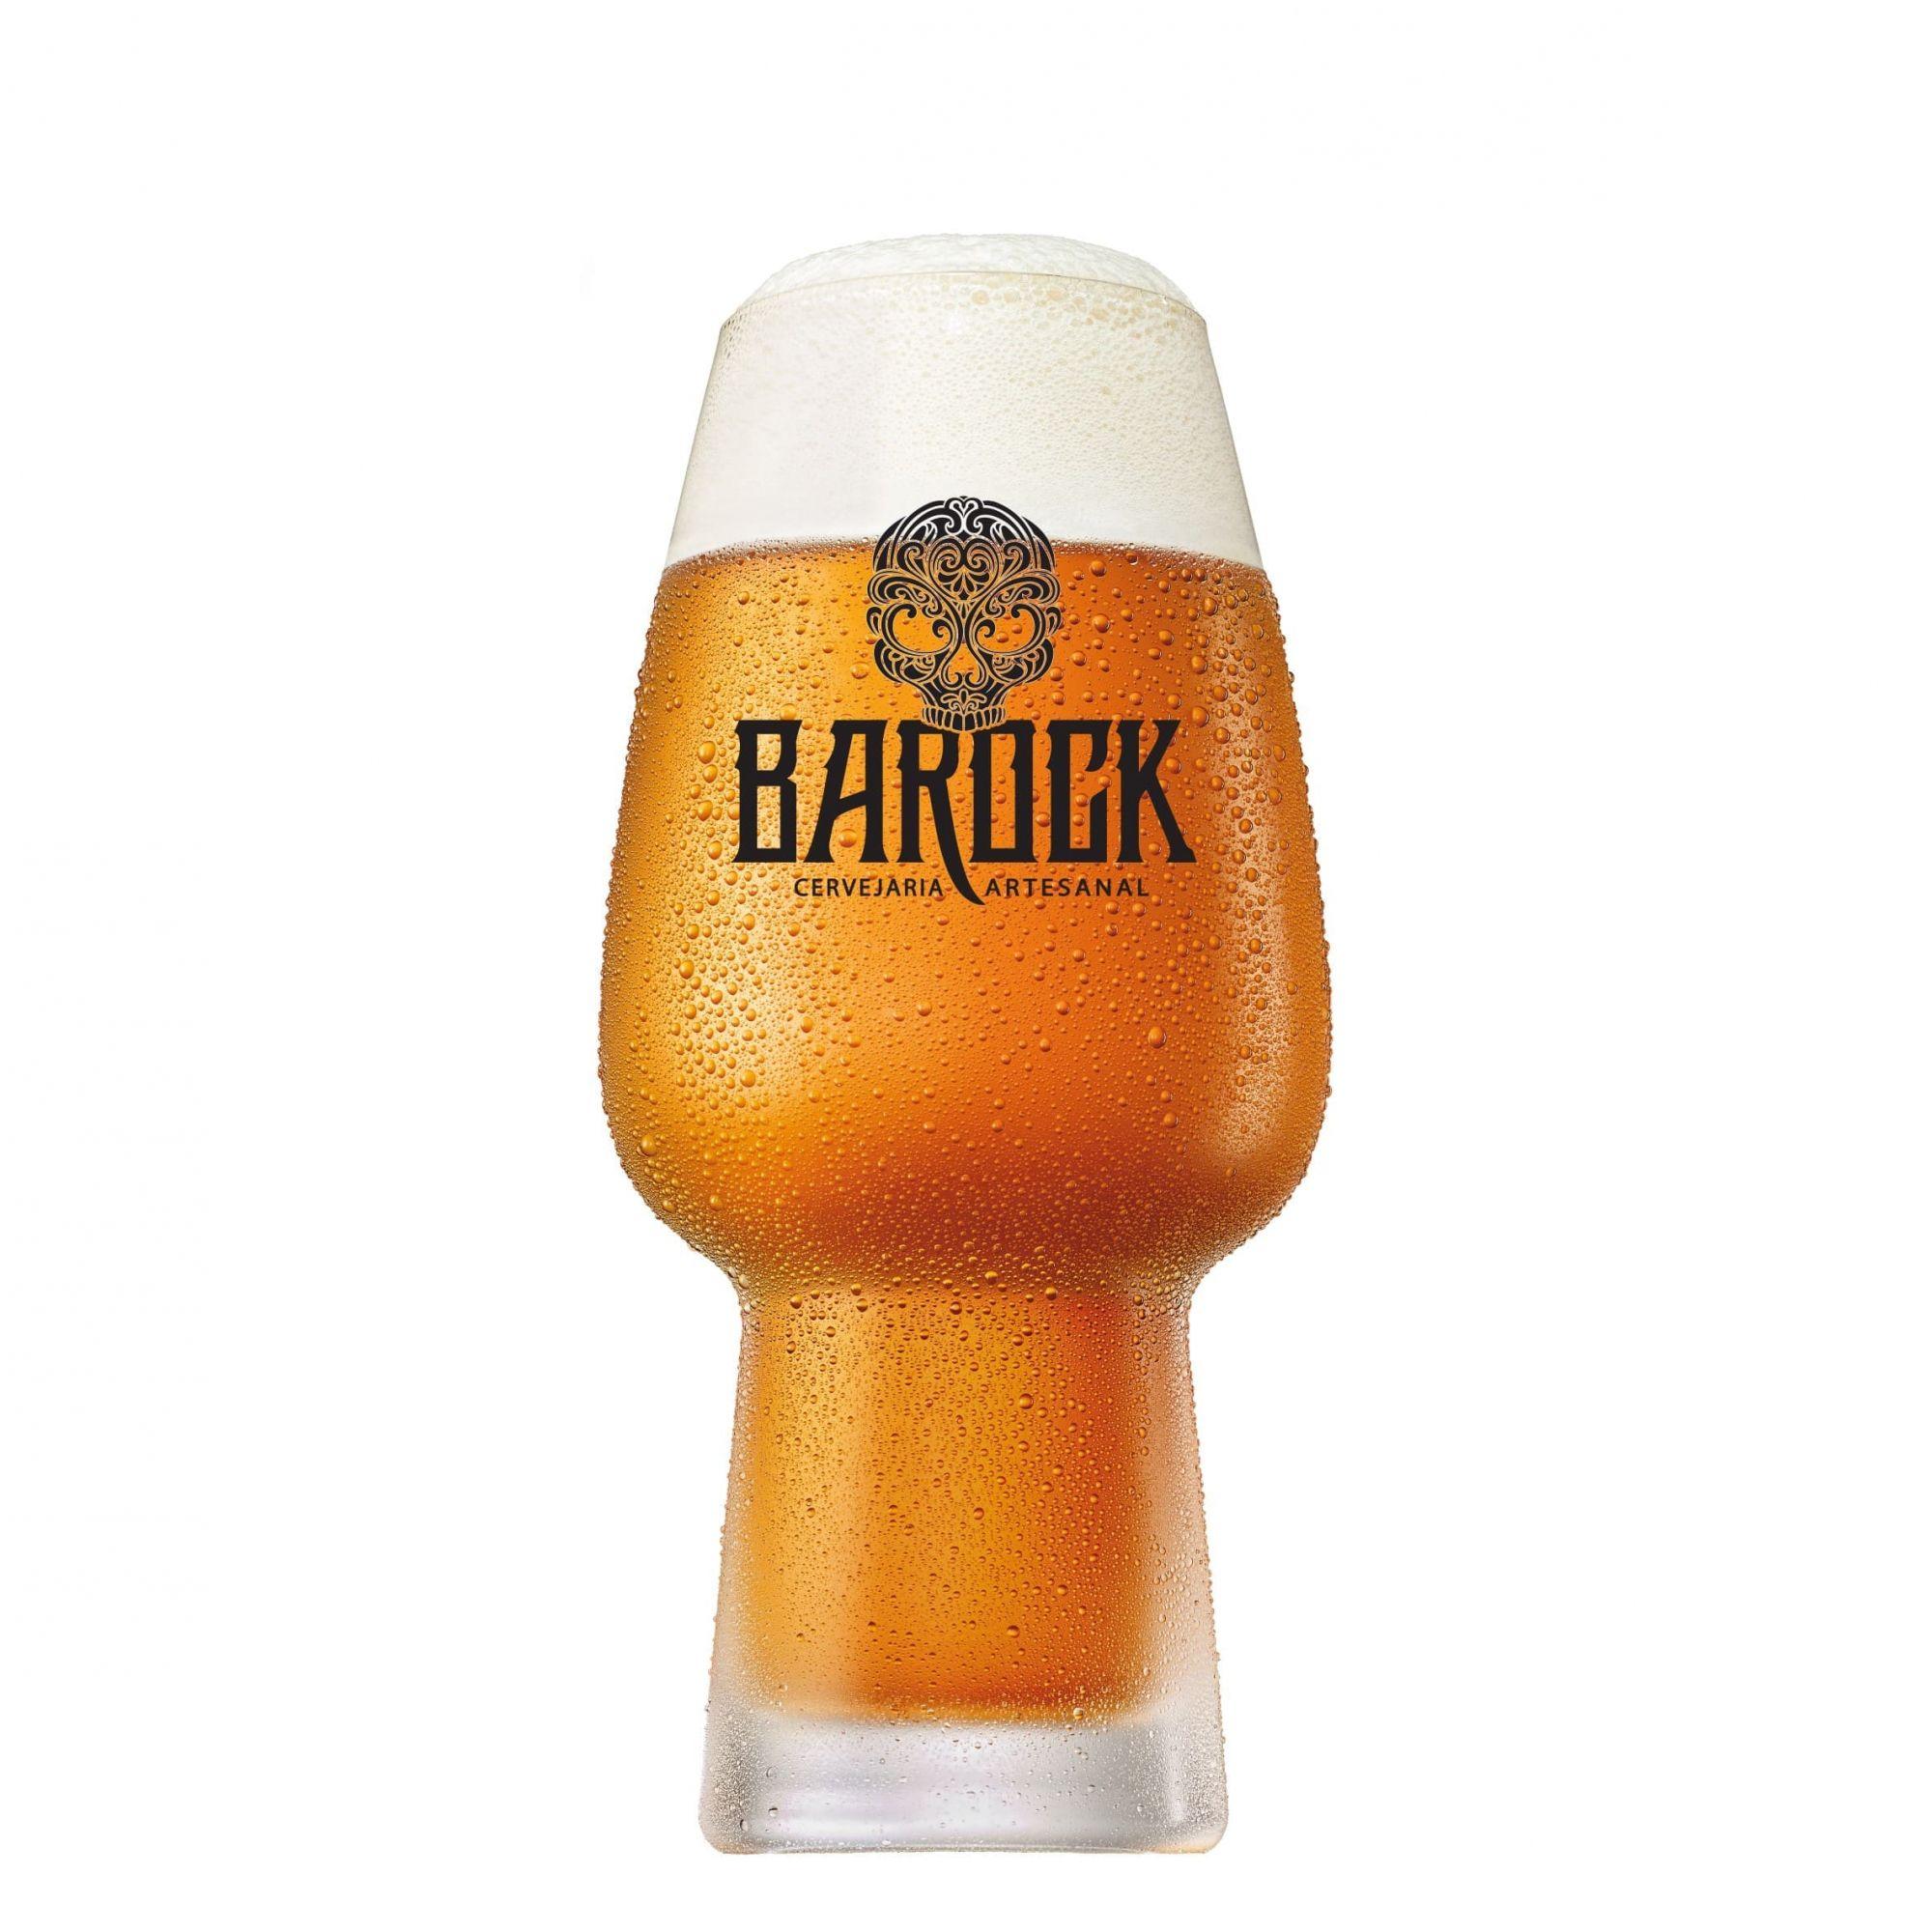 Copo de Cerveja Cristal Craft Beer Barock 400ml